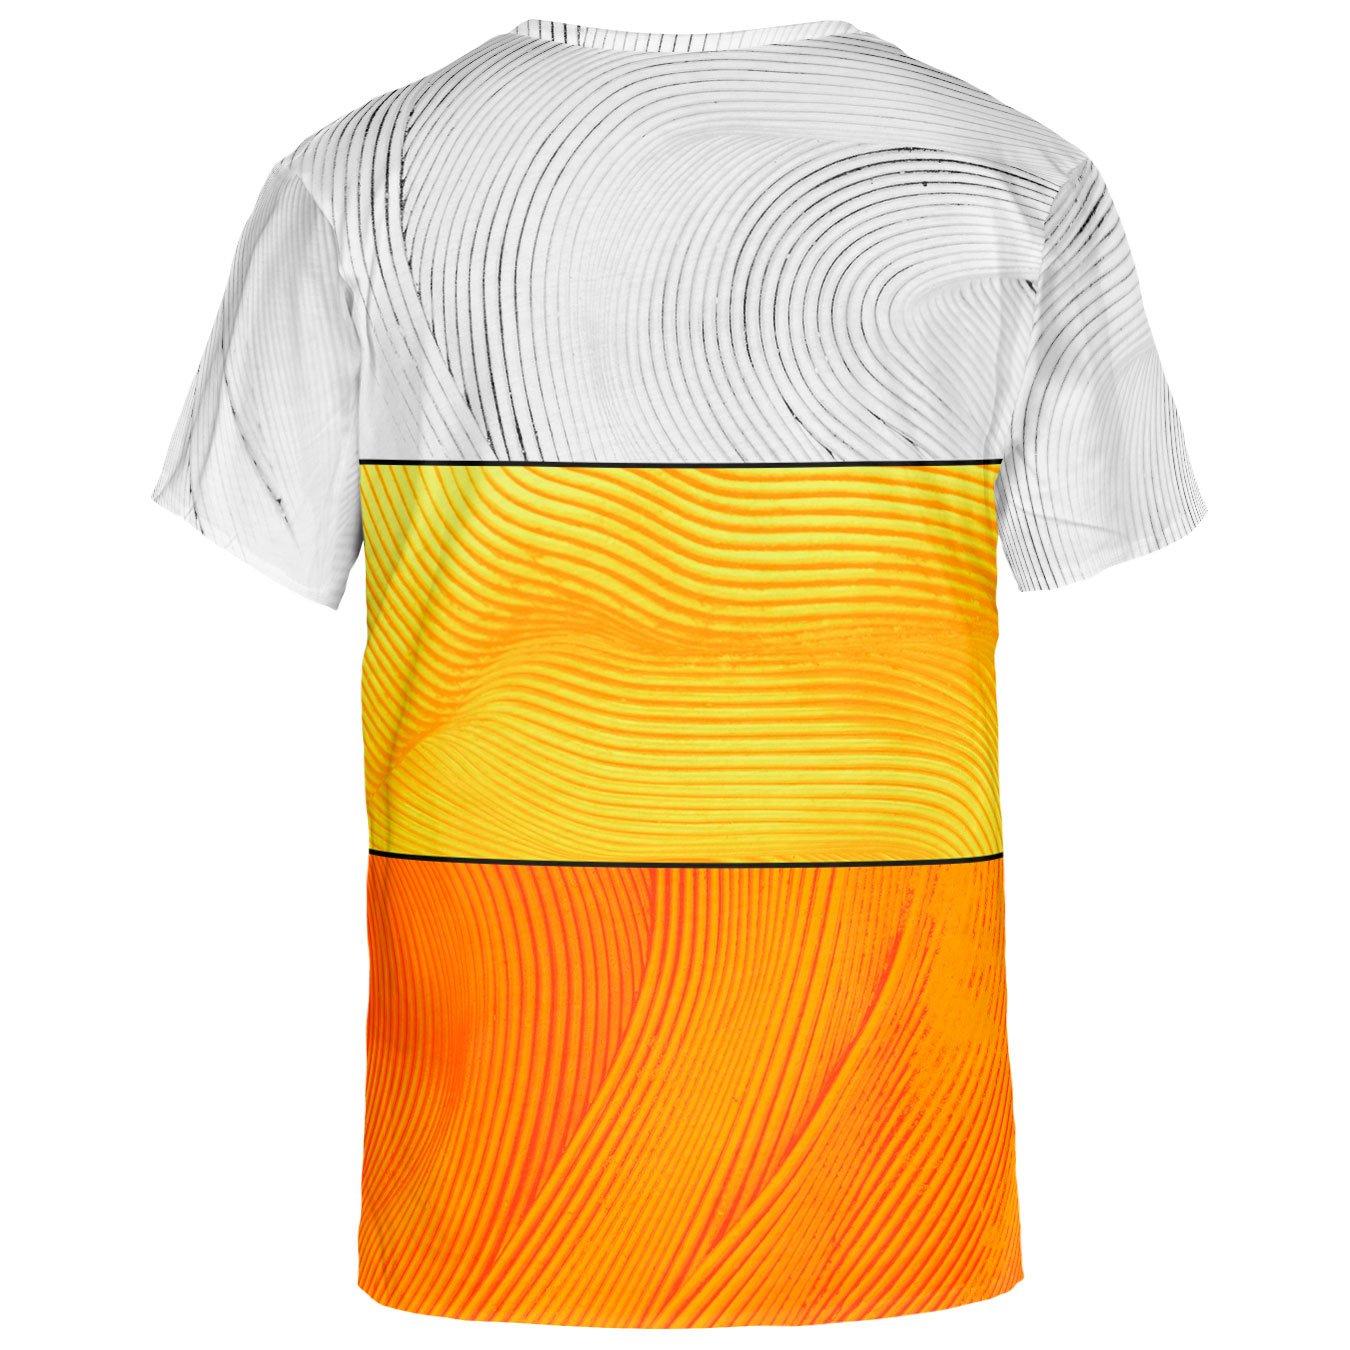 Blowhammer T-Shirt Herren Herren Herren - Energy Tee B07F1T6MJX T-Shirts Schönheit ohne Grenzen 14fc68